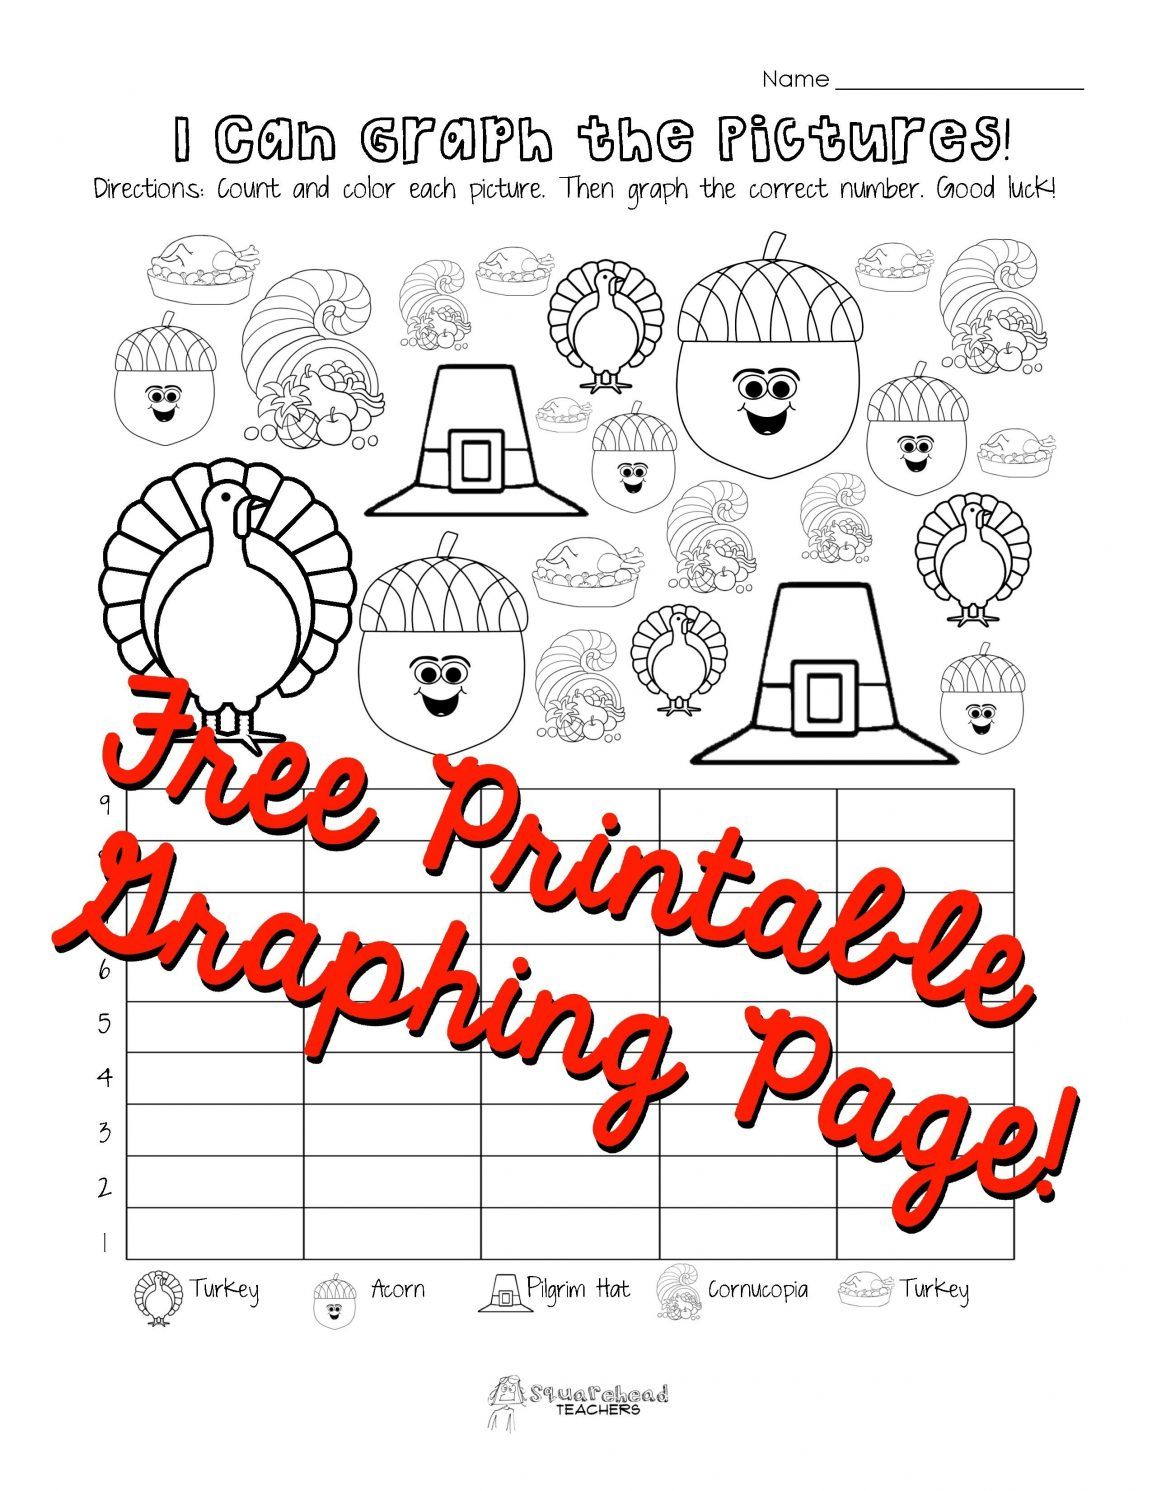 Free Printable Third Grade Math Worksheets Math Worksheets Free | Free Printable Thanksgiving Math Worksheets For 3Rd Grade